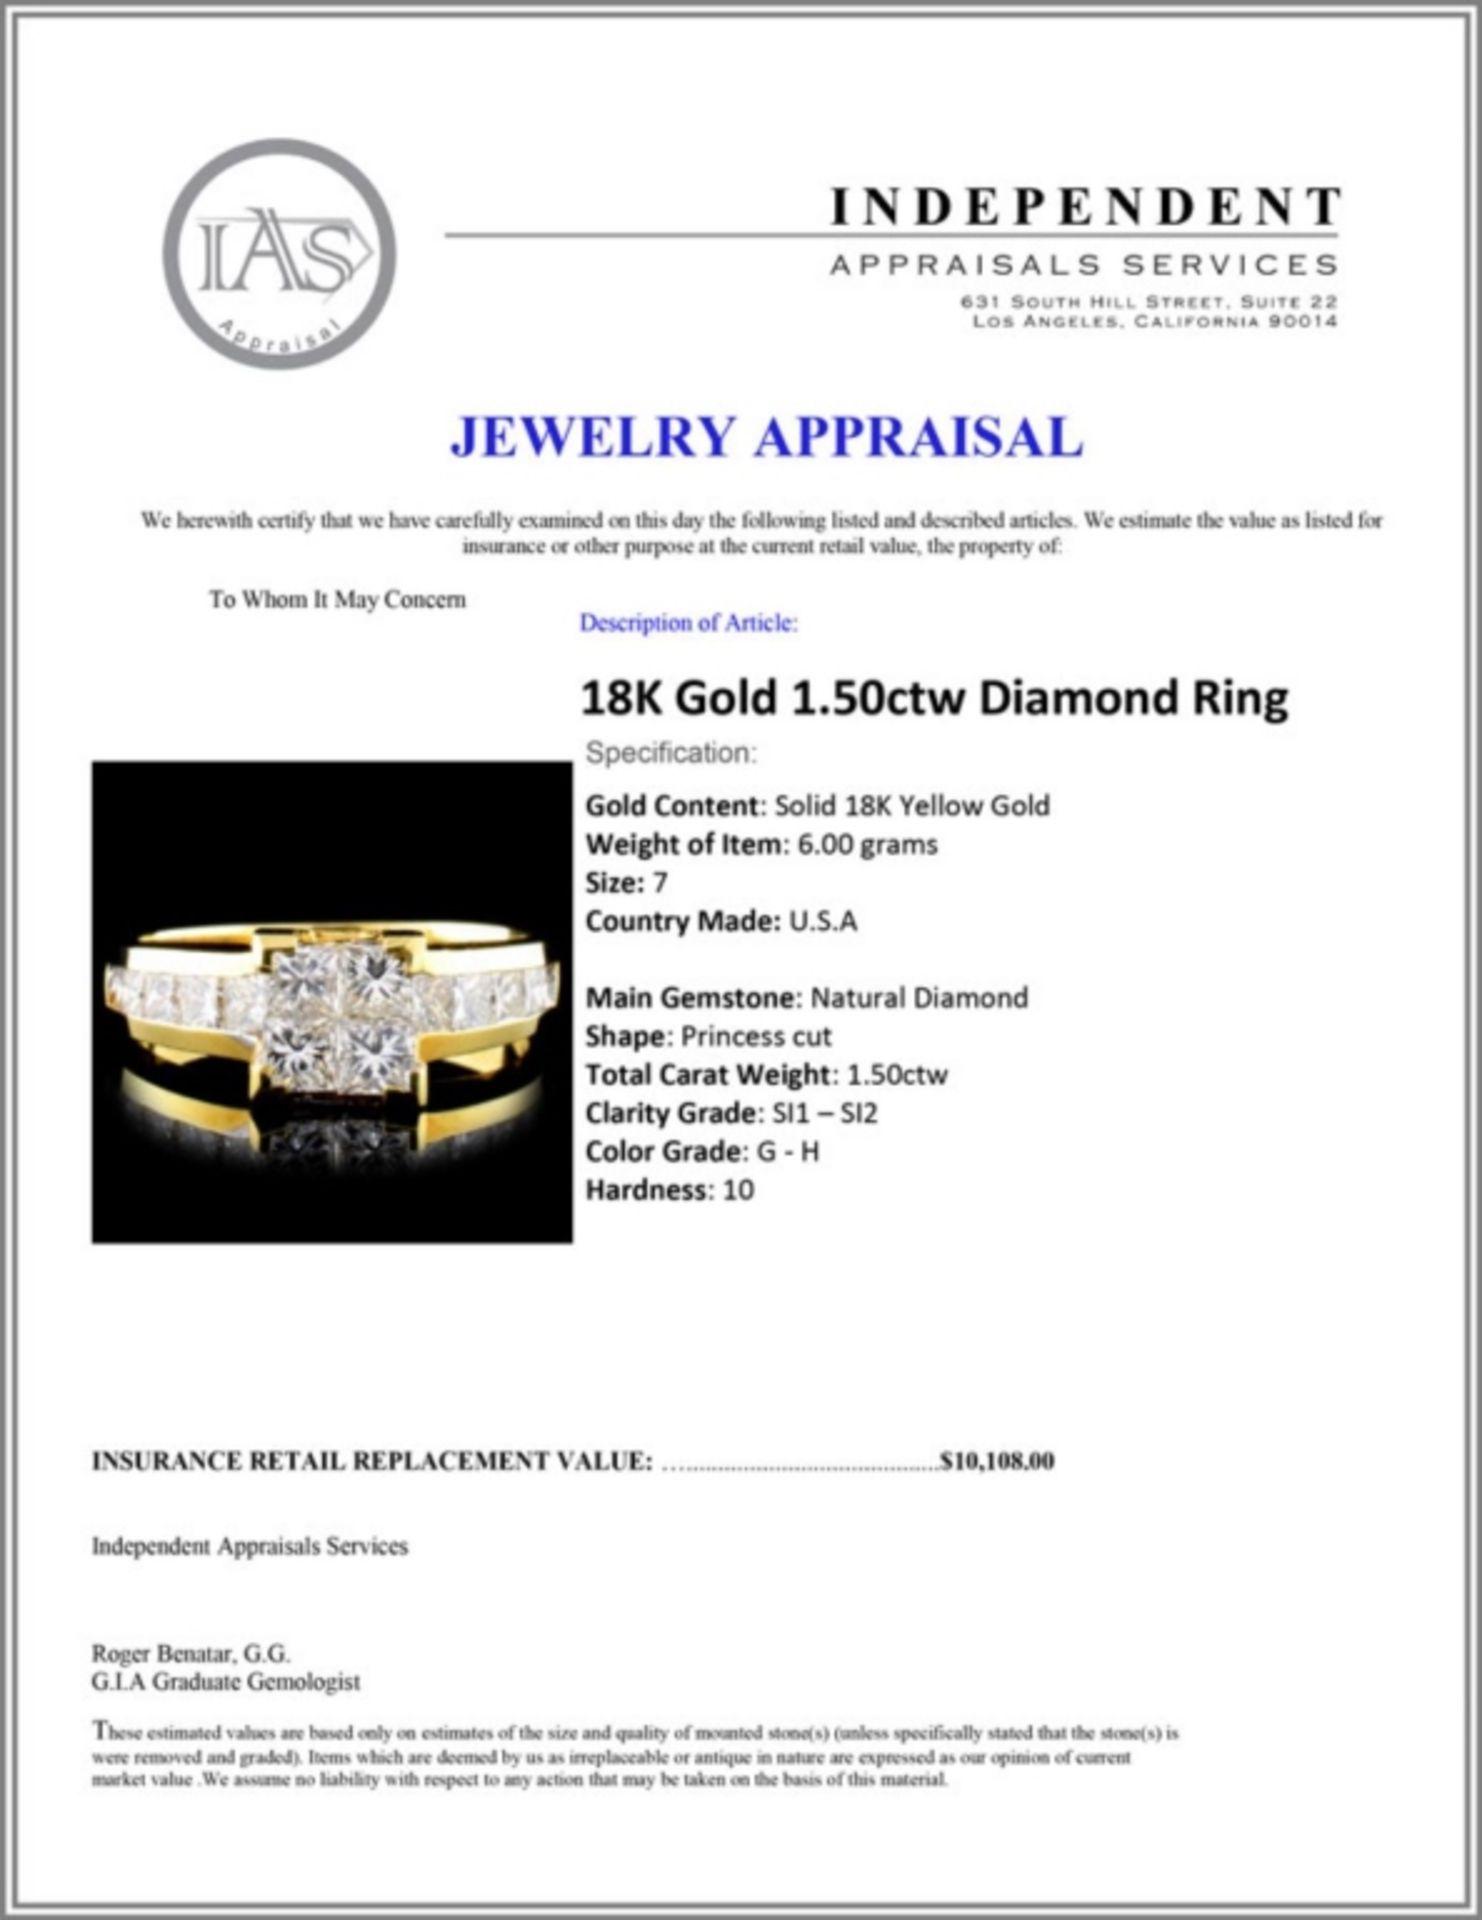 18K Gold 1.50ctw Diamond Ring - Image 5 of 5